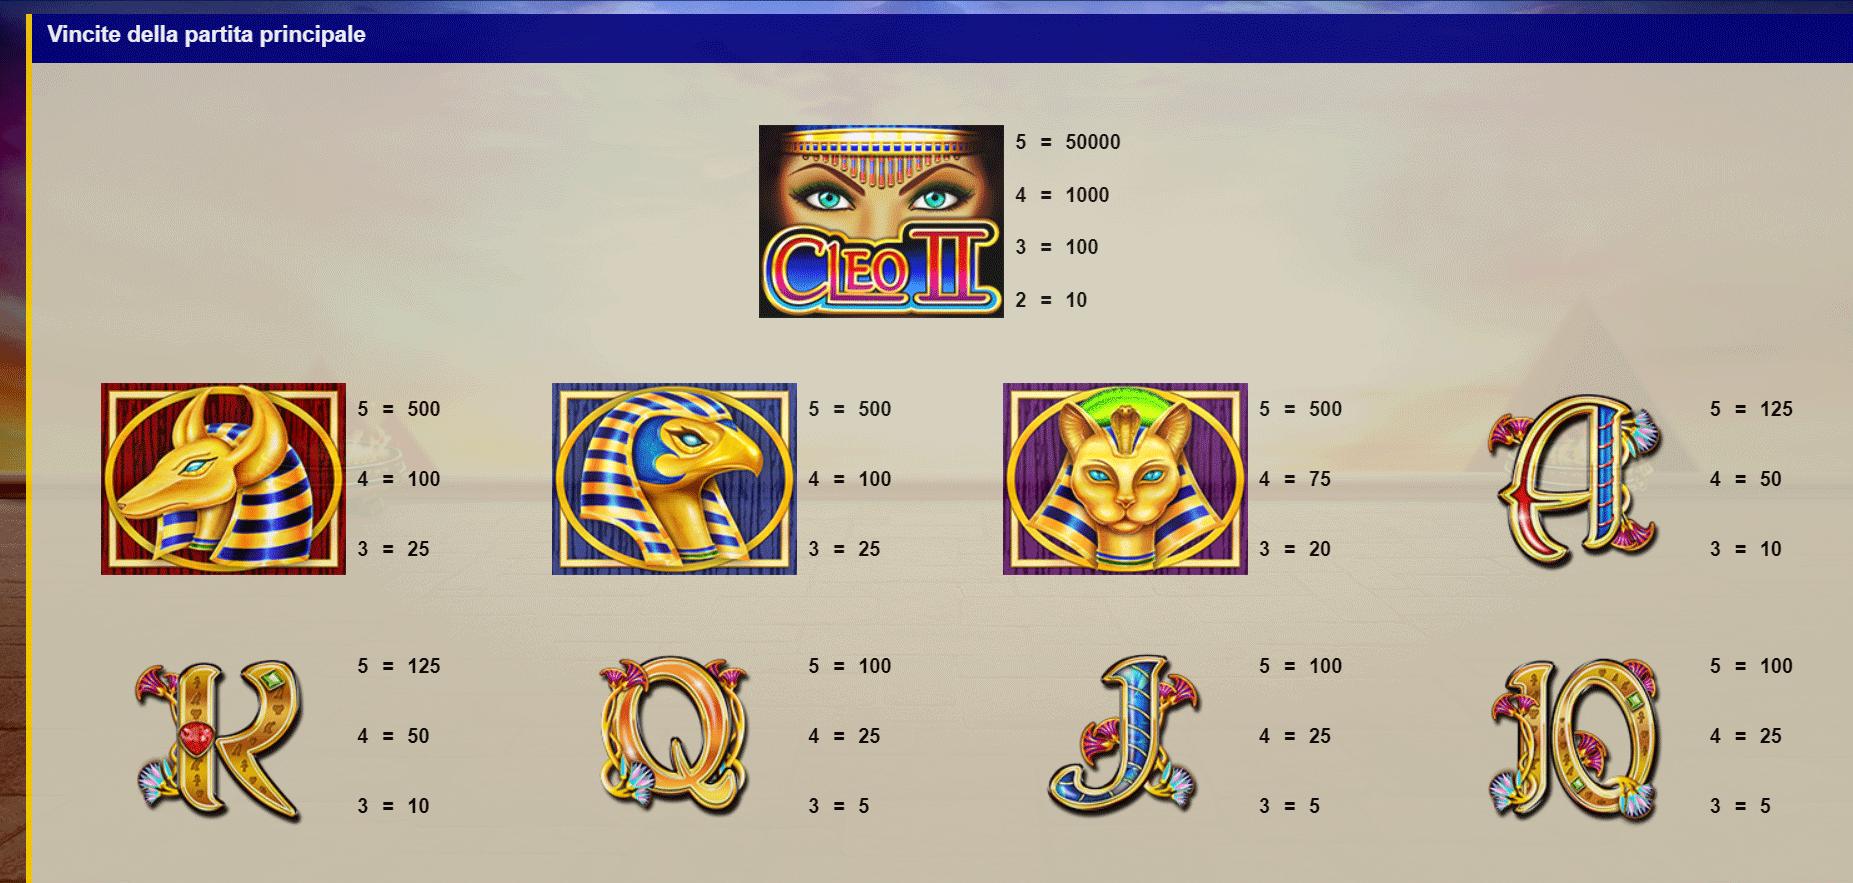 paytable della slot online Cleopatra II